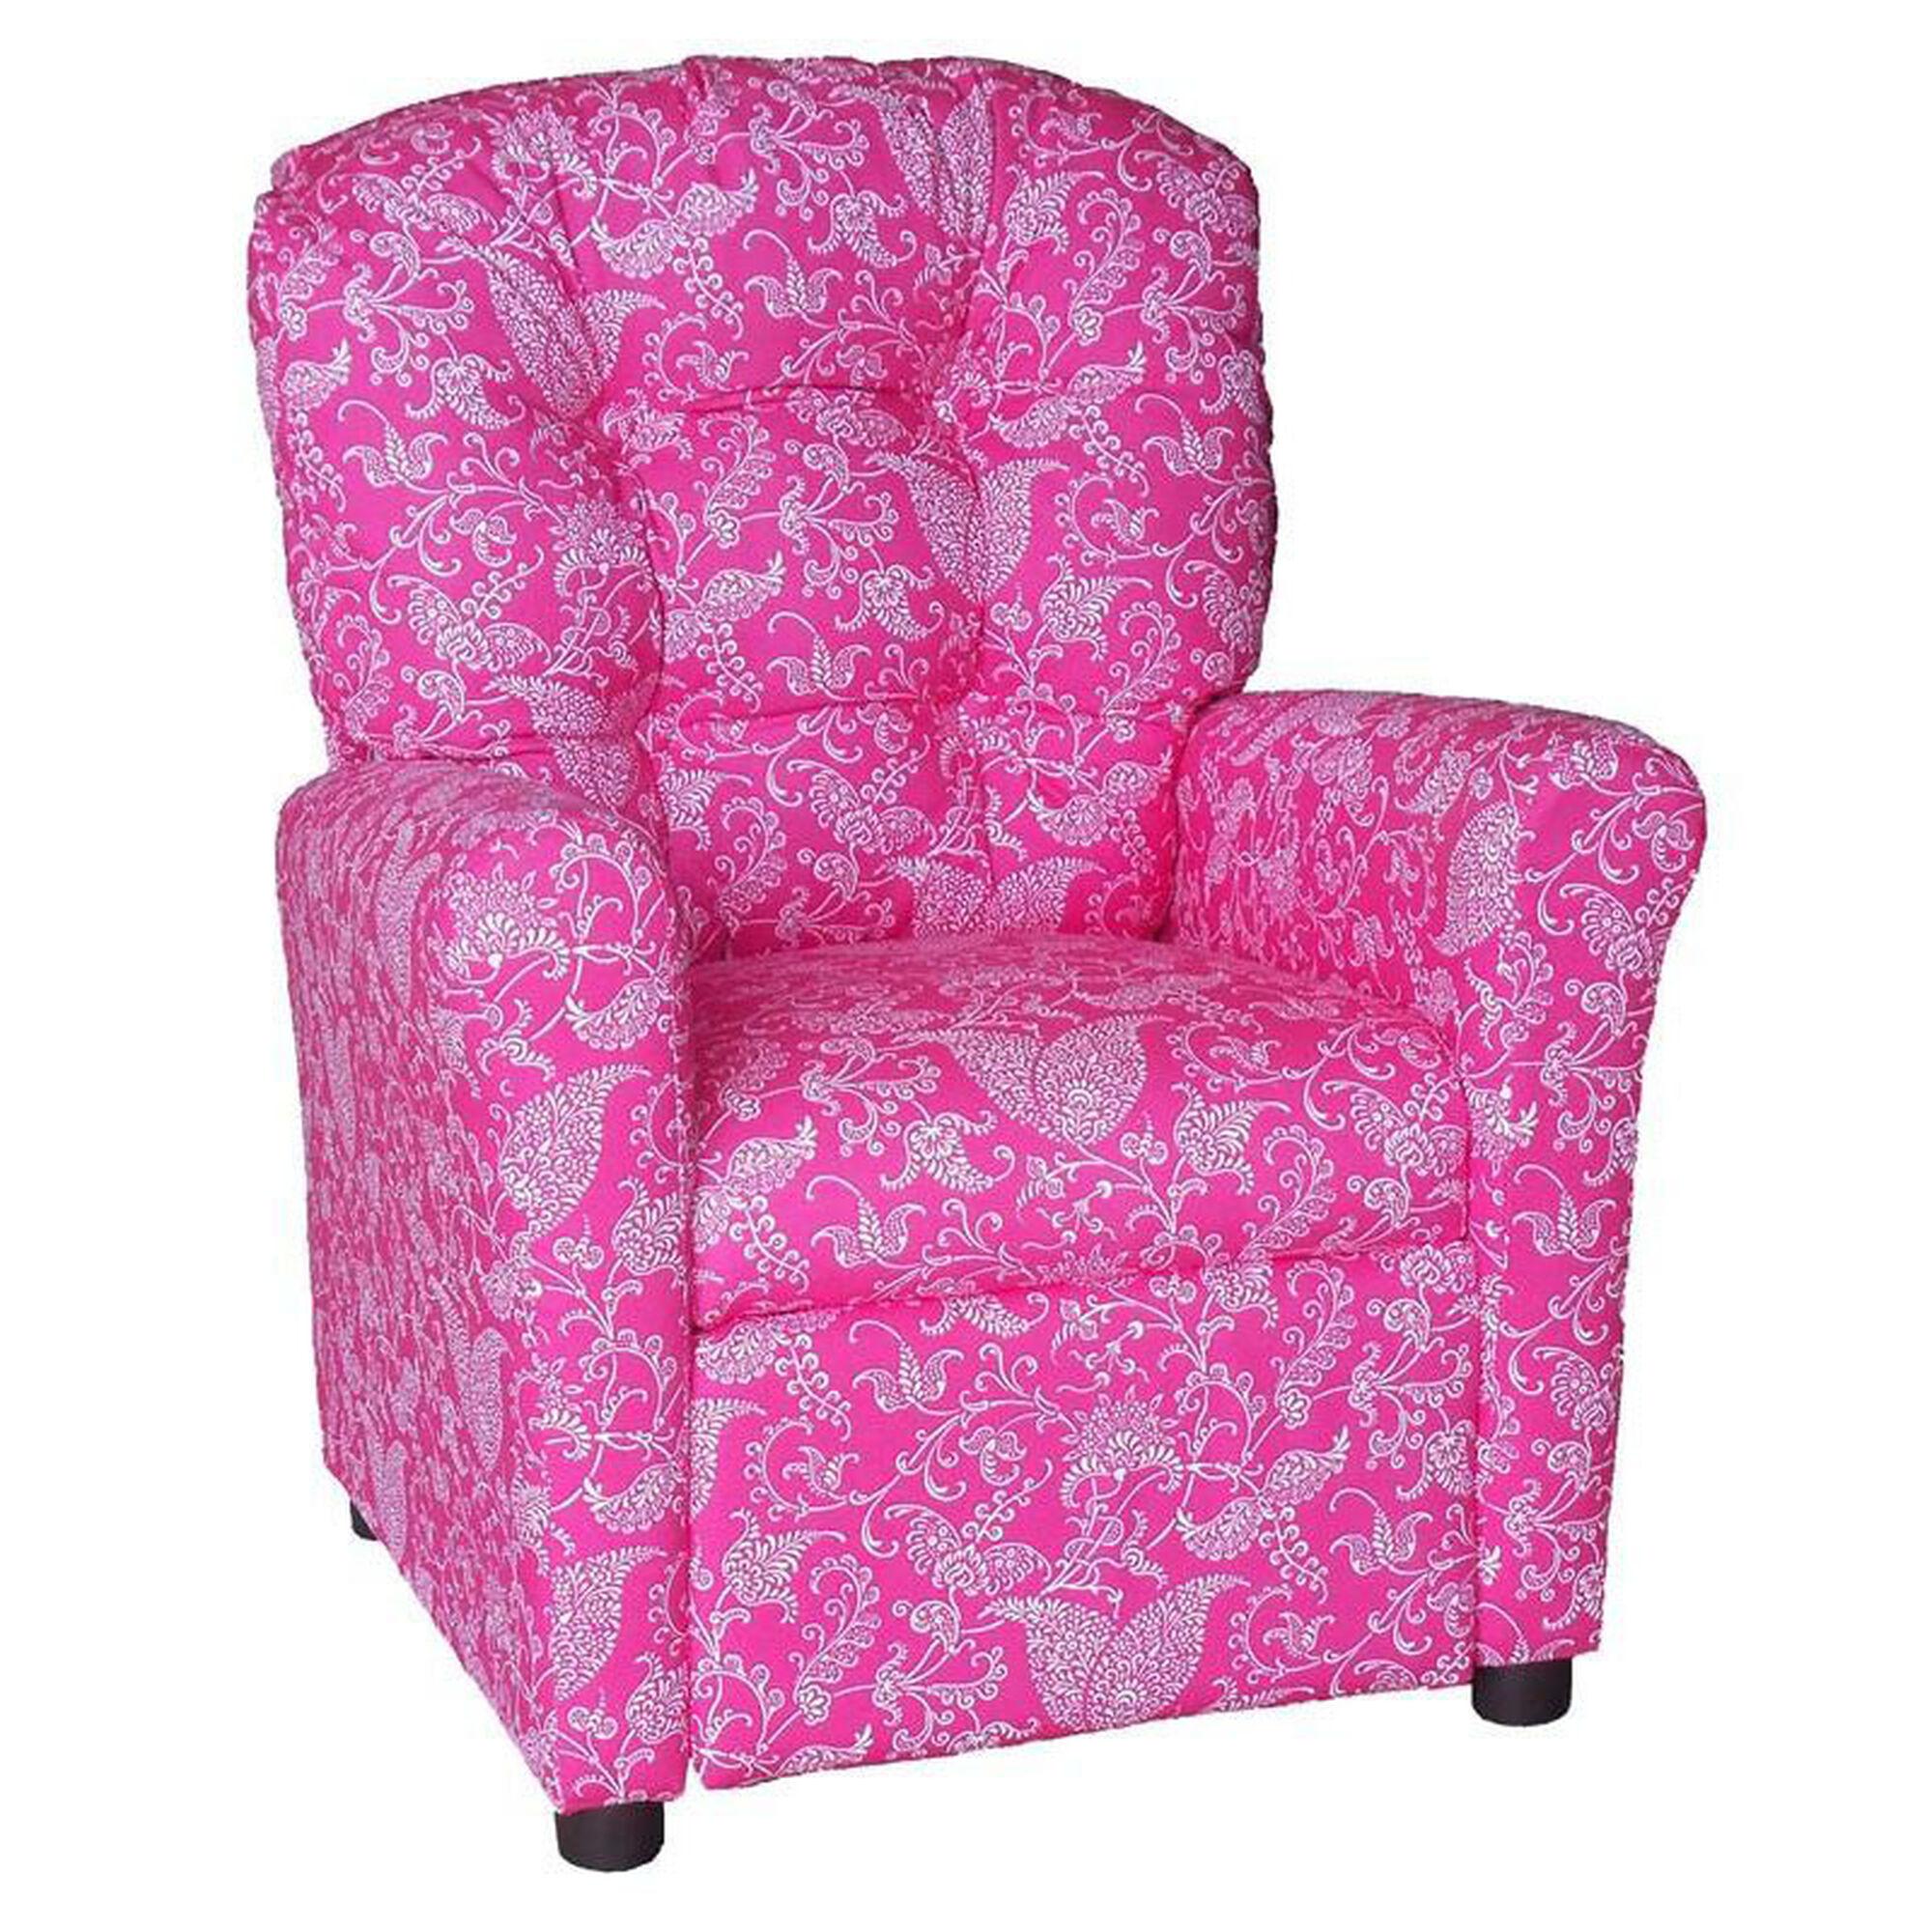 Brazil Furniture 400 Small Paisley Pink Bz 400 Small